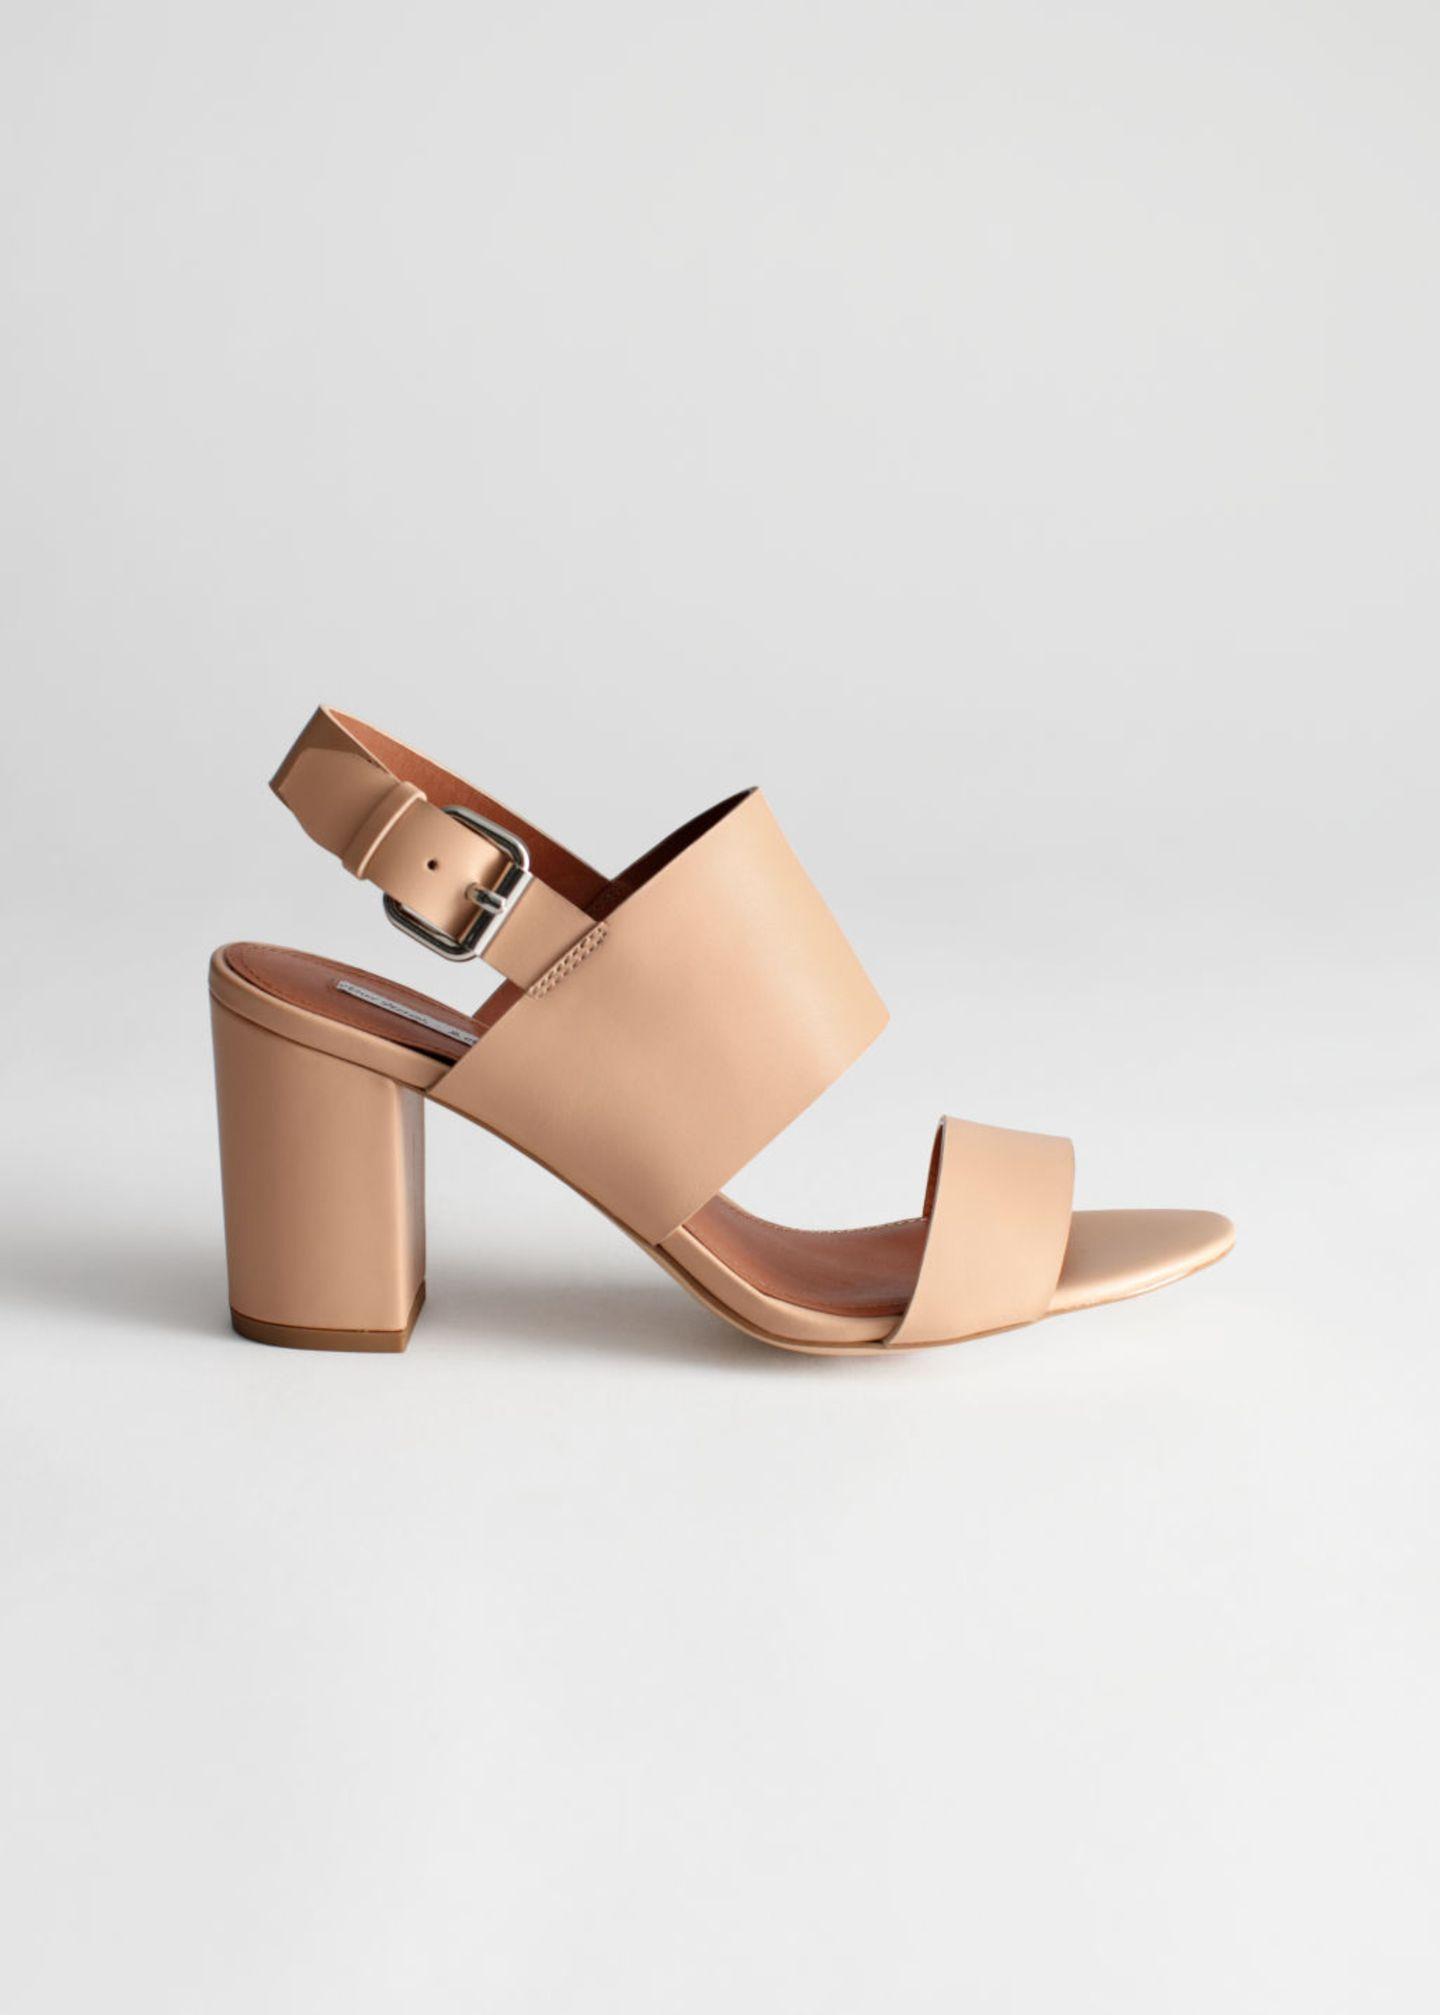 1 Style, 2 Look: Chunky Heel